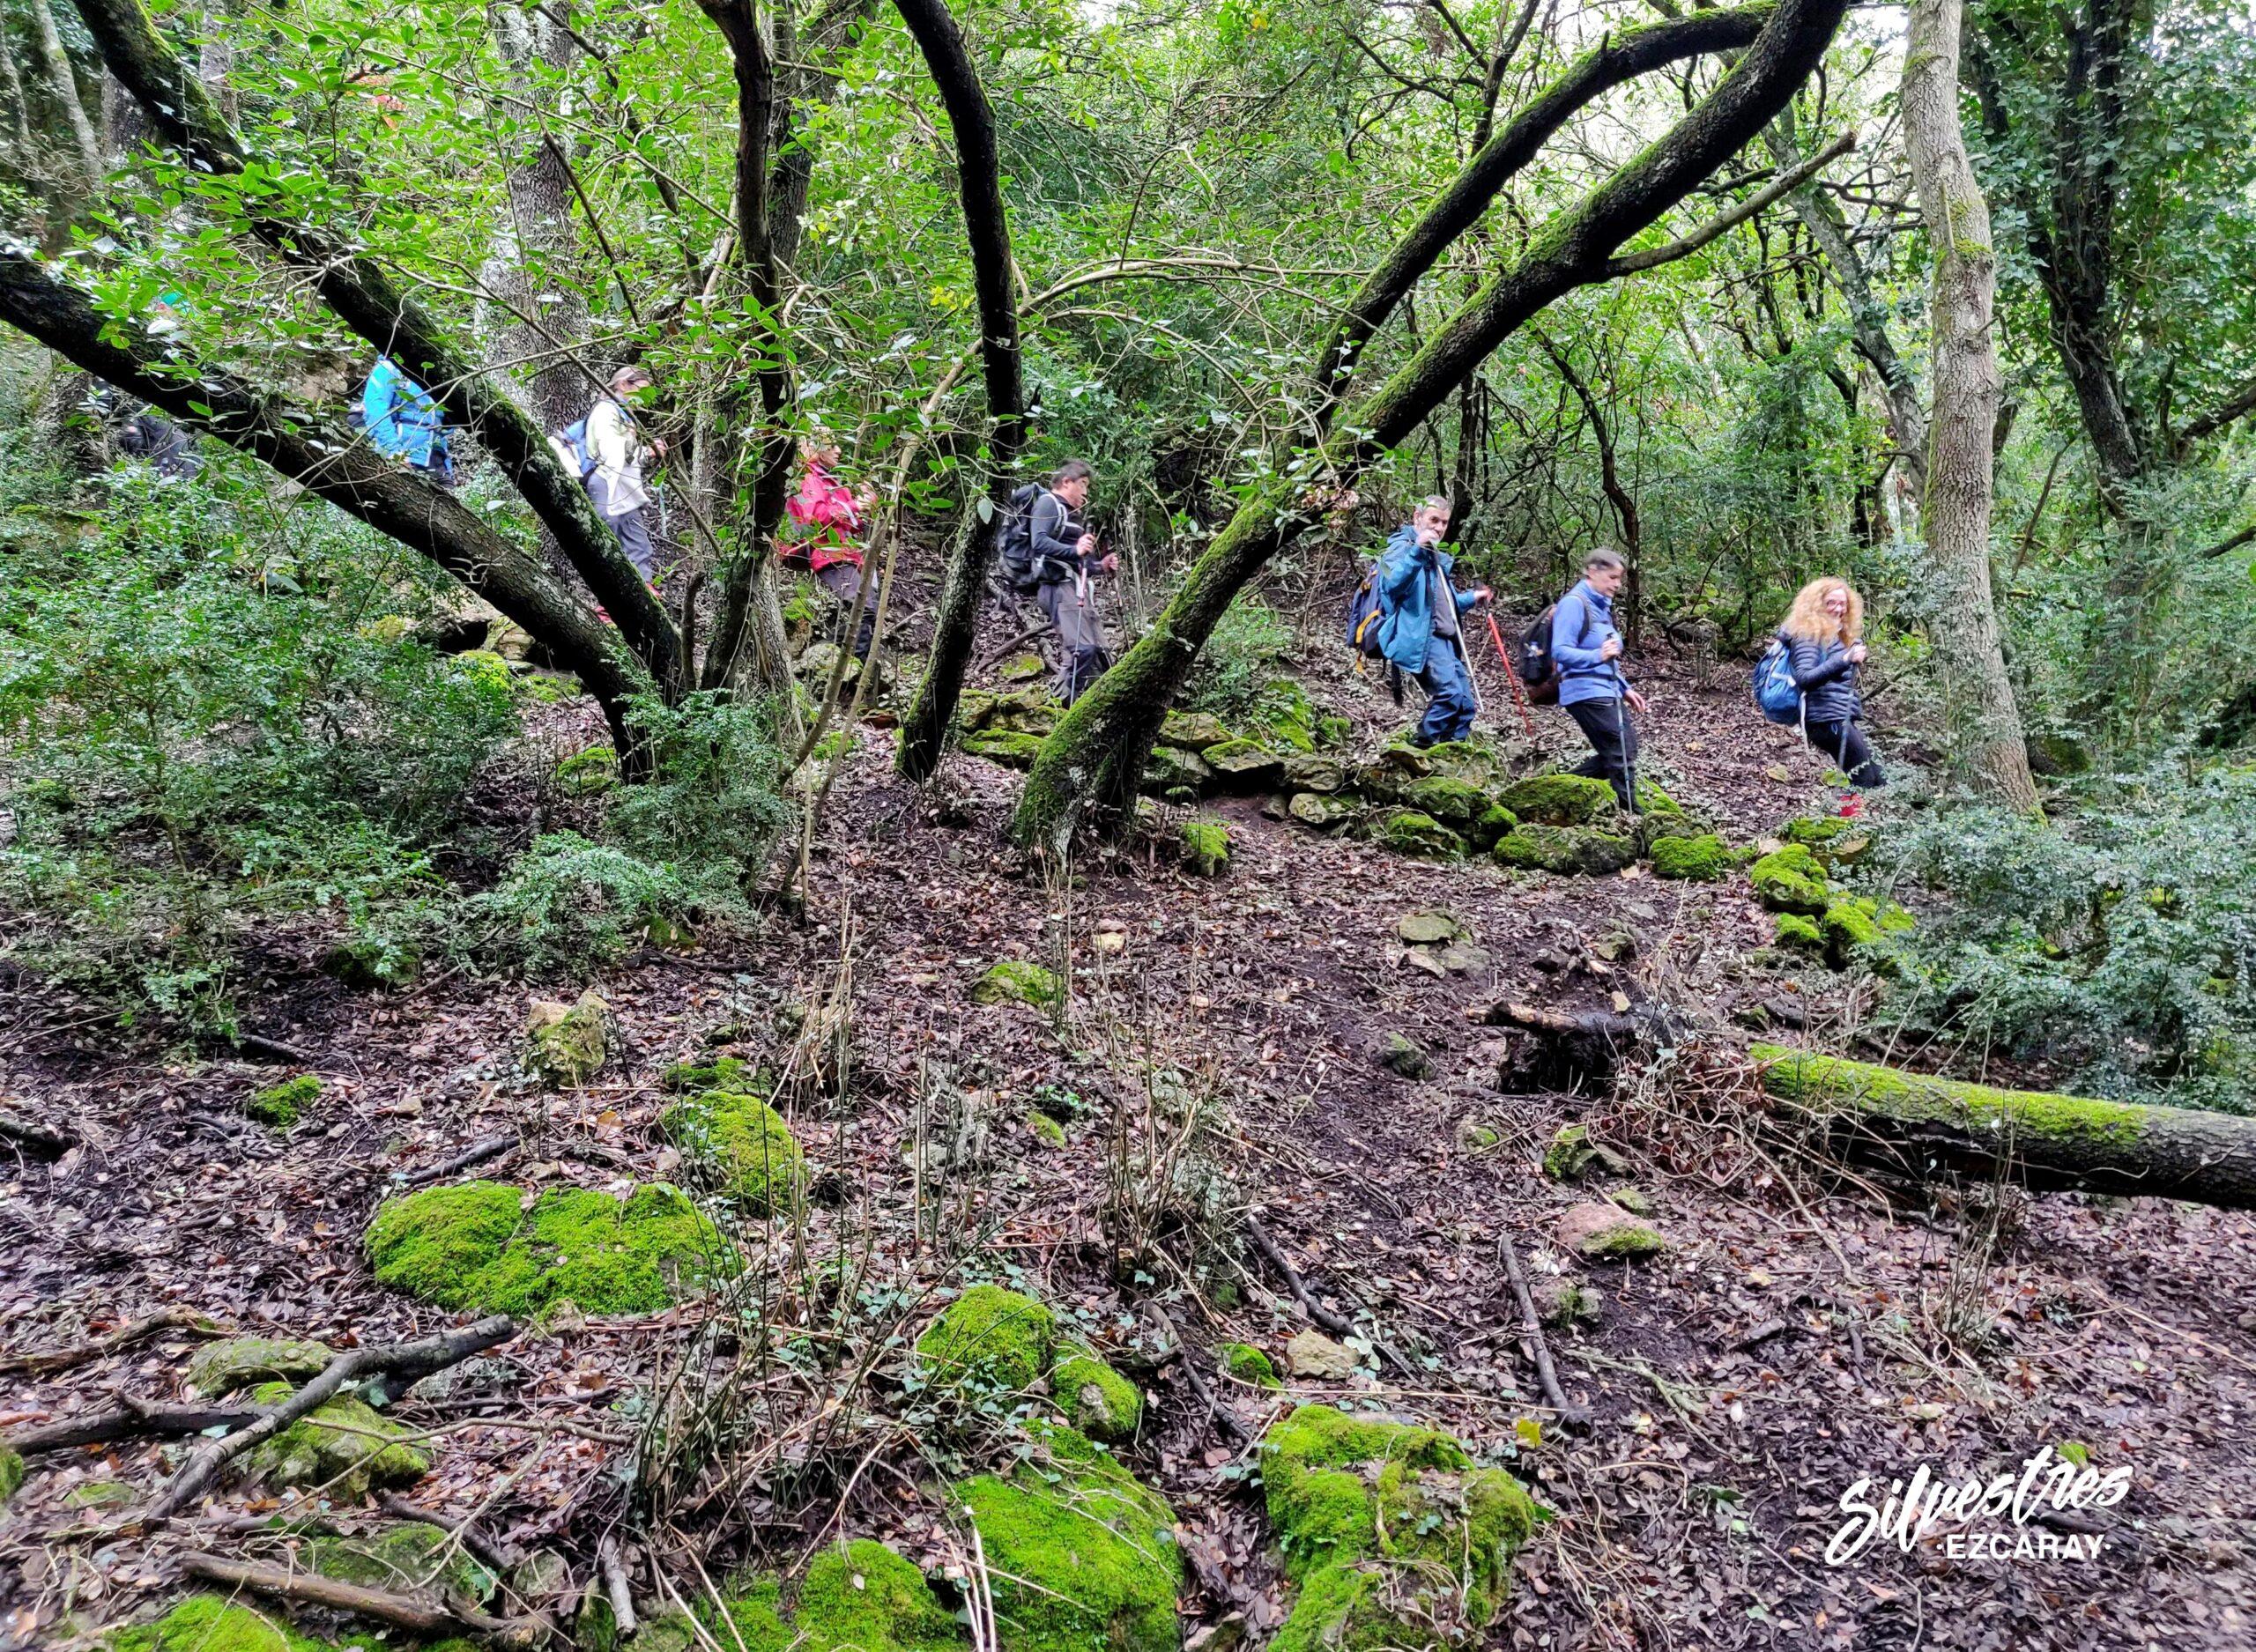 senderismo_rutas_tracks_montes_obarenes_senda_los_tejos_guia_montaña_naturaleza